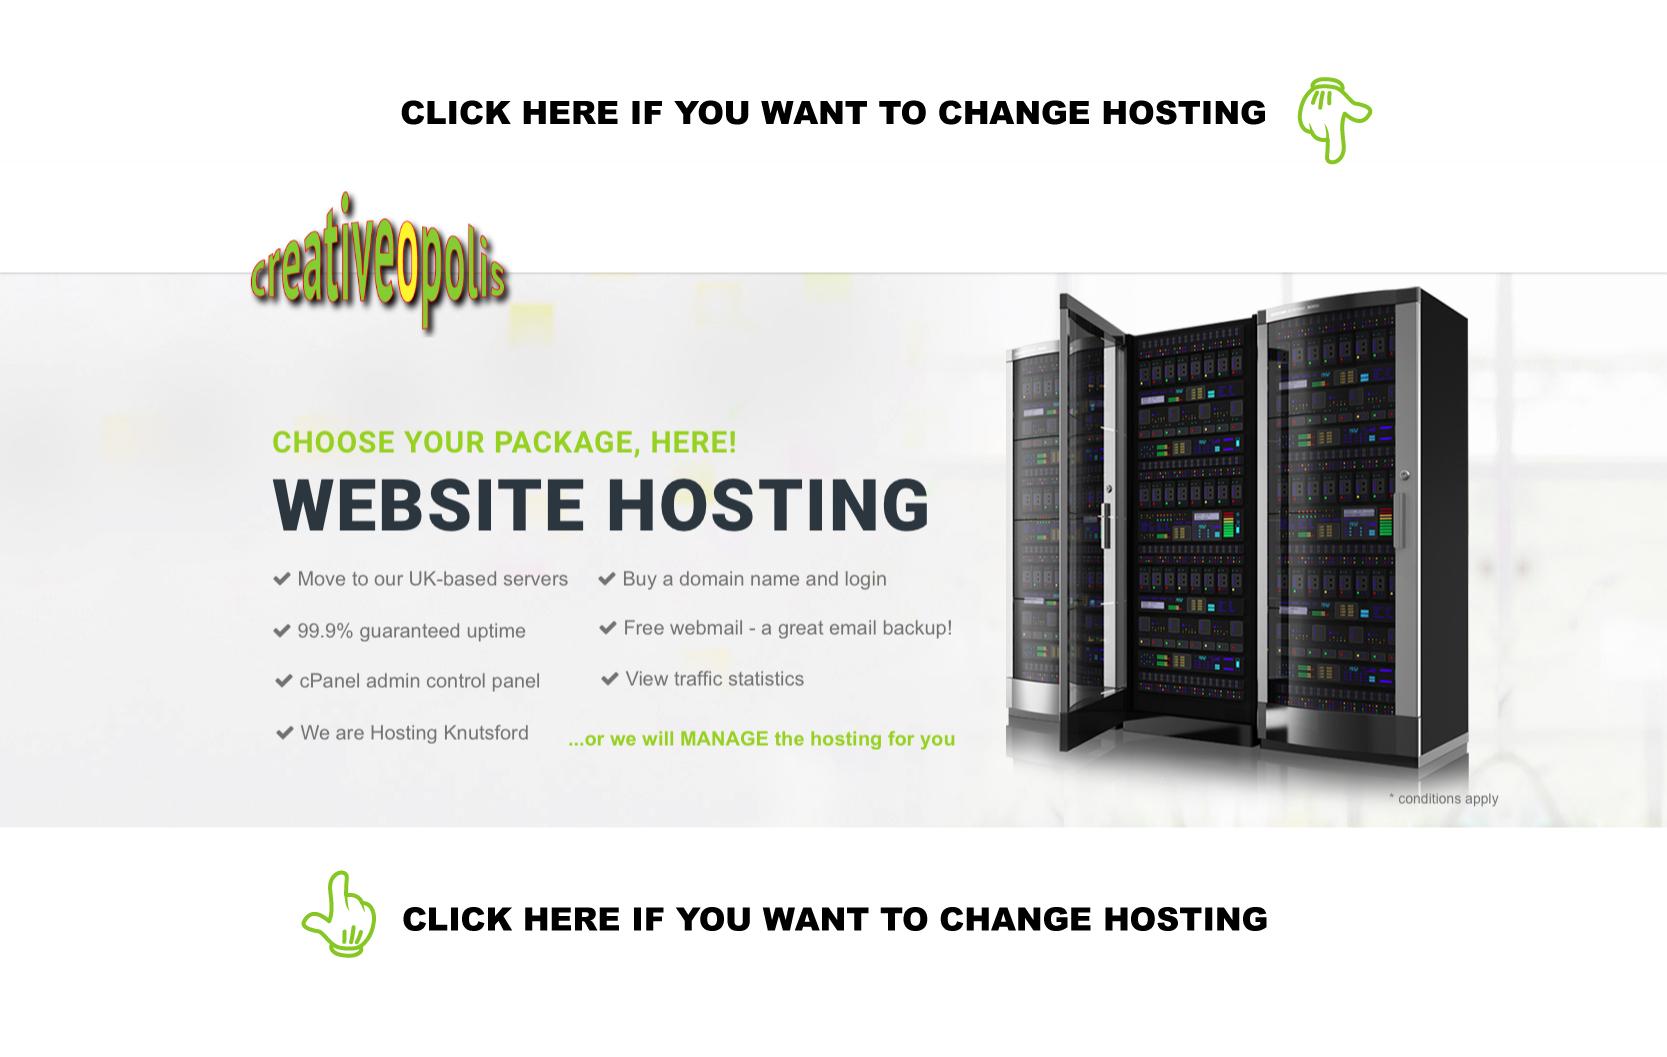 website design knutsford SEO hosting social media Cheshire domain names 03 - Hosting